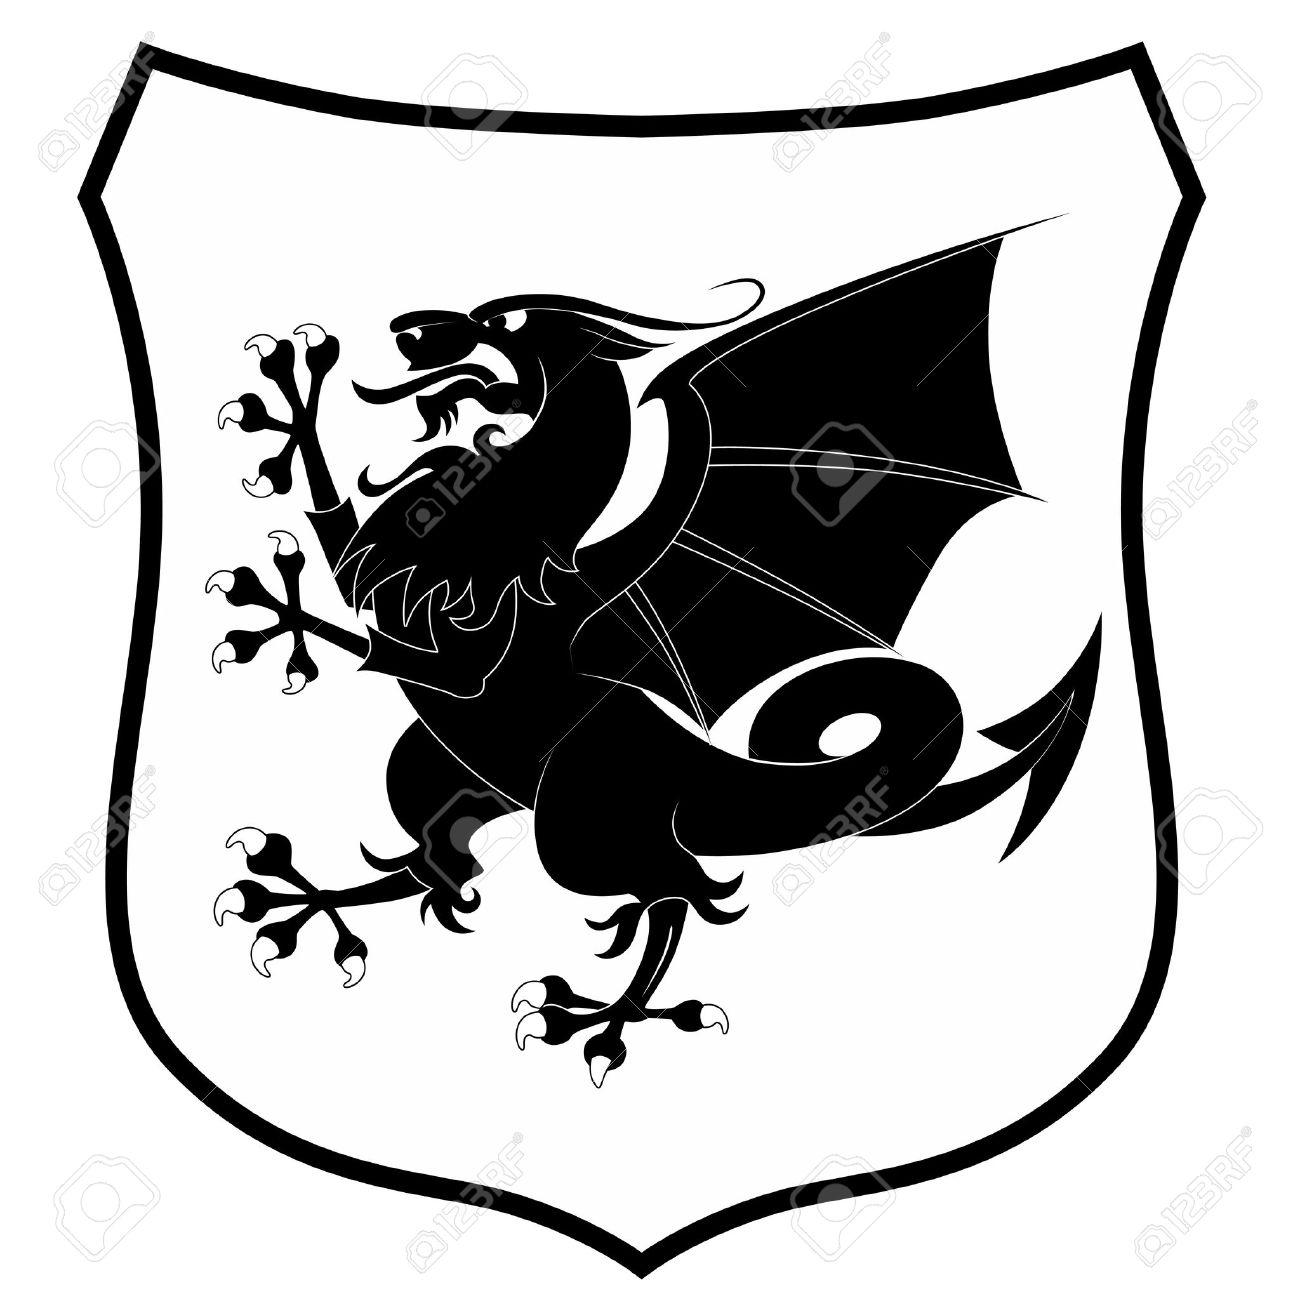 Heraldic dragon isolated on white background - 10289848